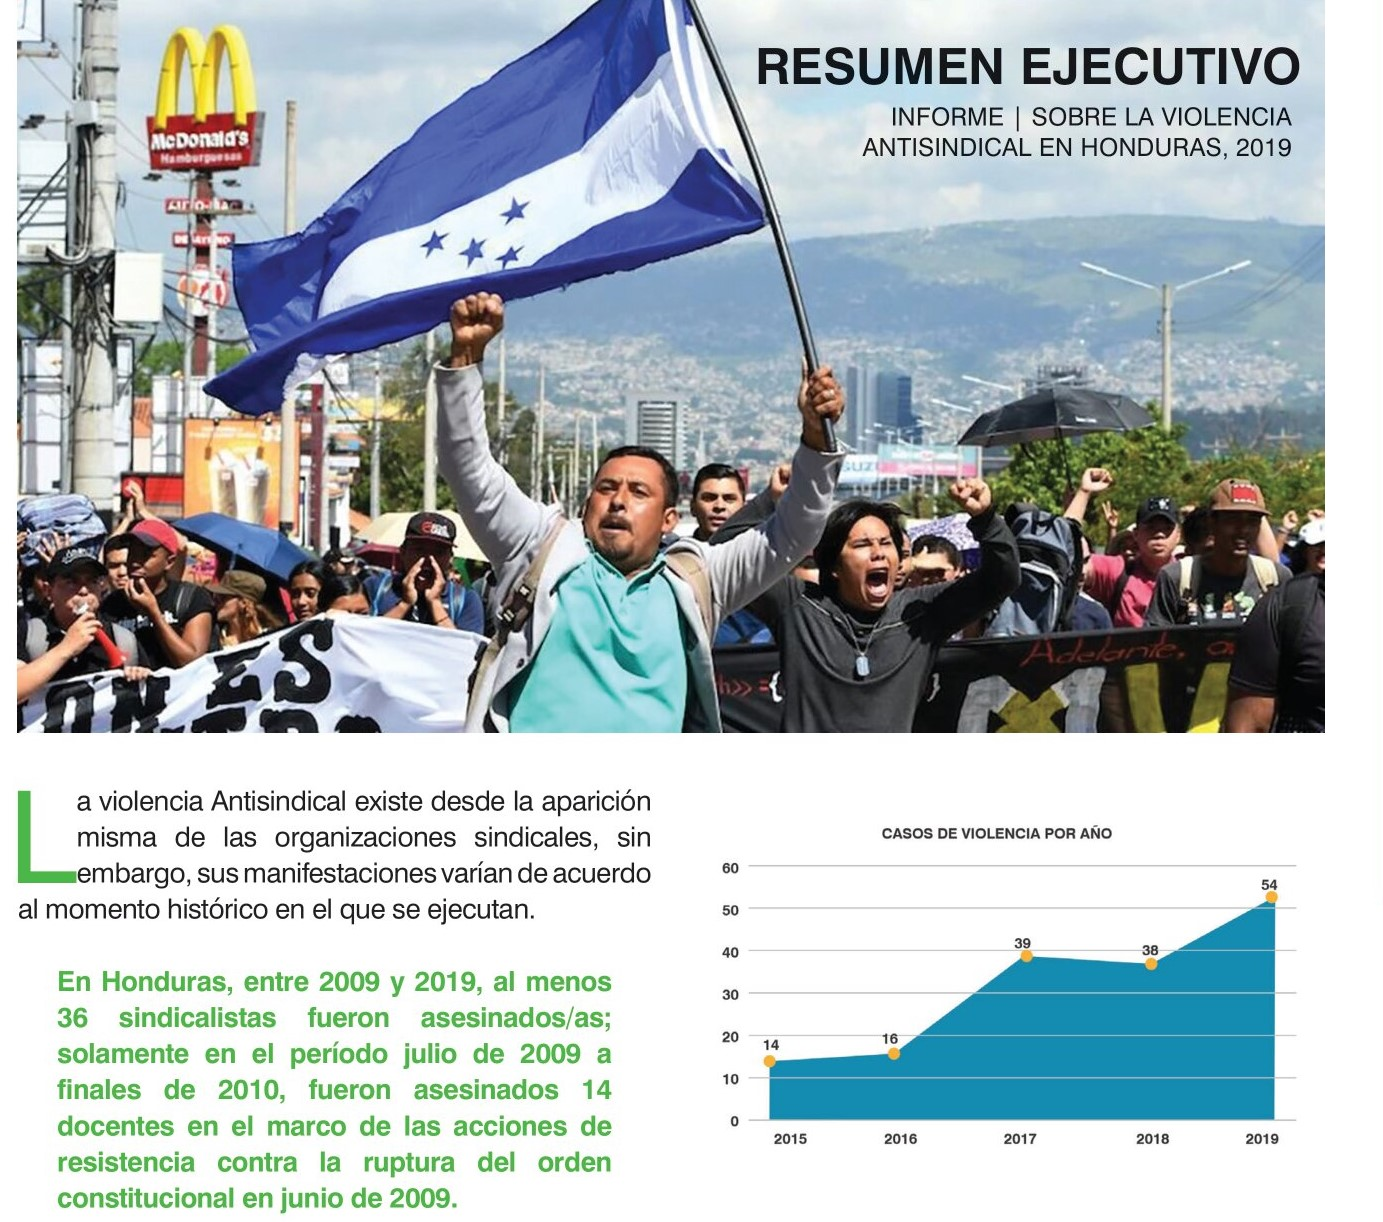 Honduras / Informe de la violencia antisindical